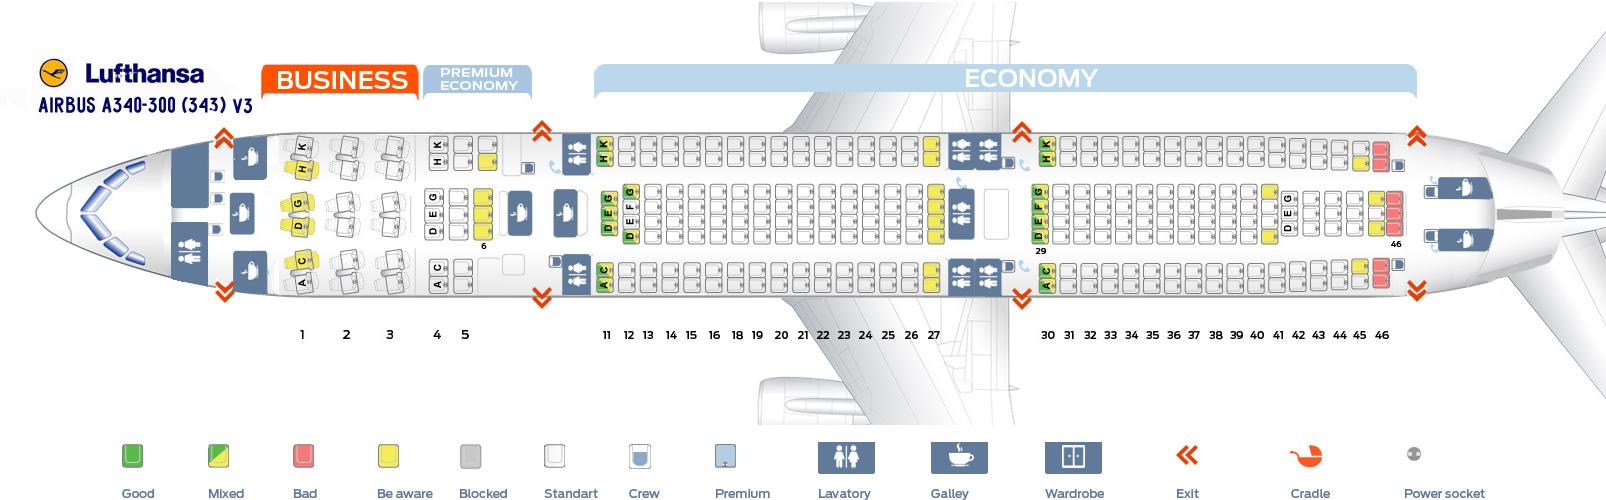 Seat_map_Lufthansa_Airbus_A340-300_v3